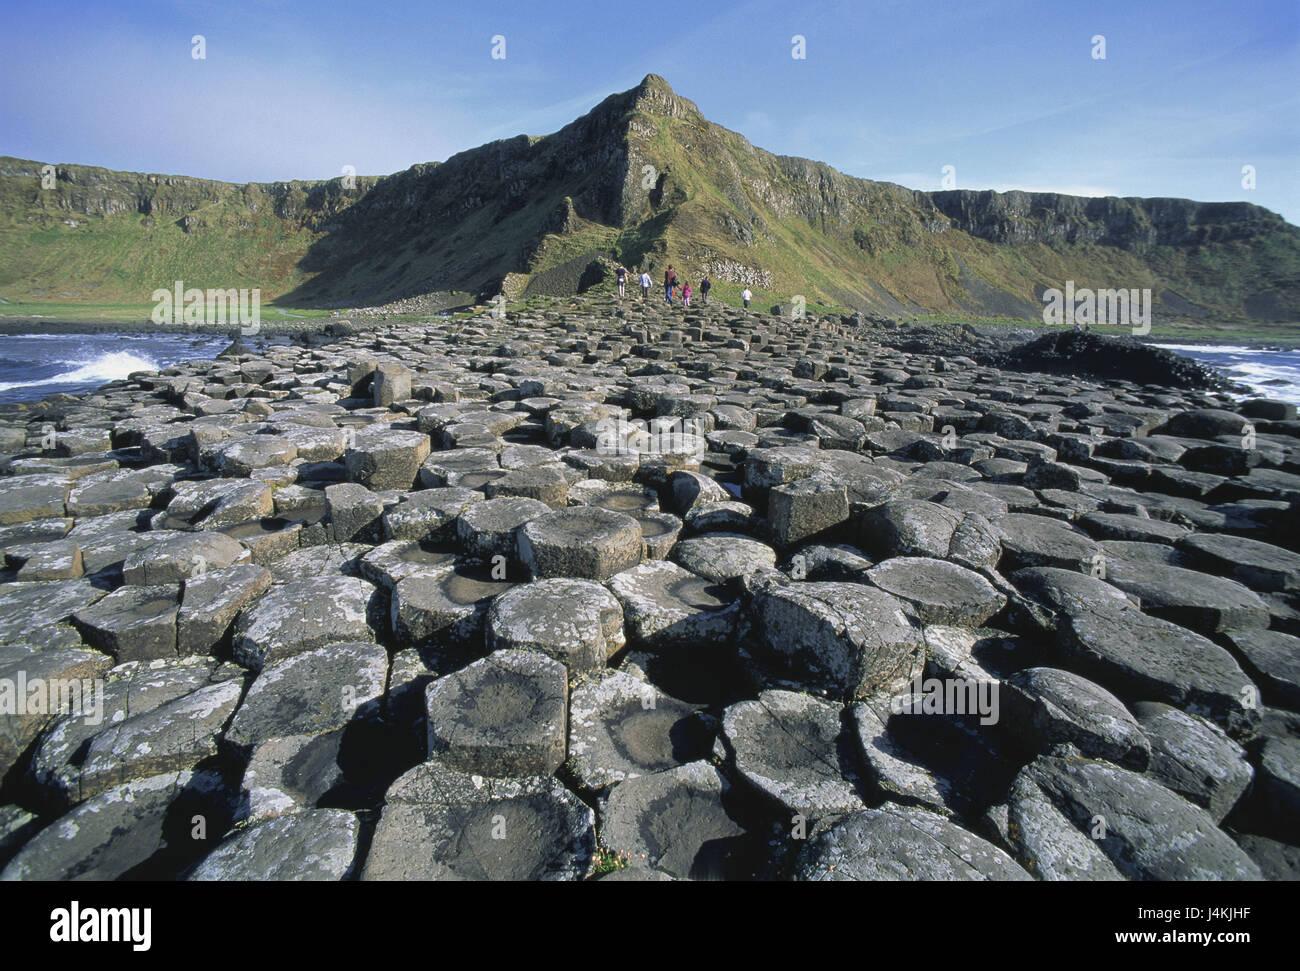 Northern Ireland, county Antrim, bile coast, Giant's Causeway, tourist Ireland, Northern Ireland, coast, basalt, Stock Photo